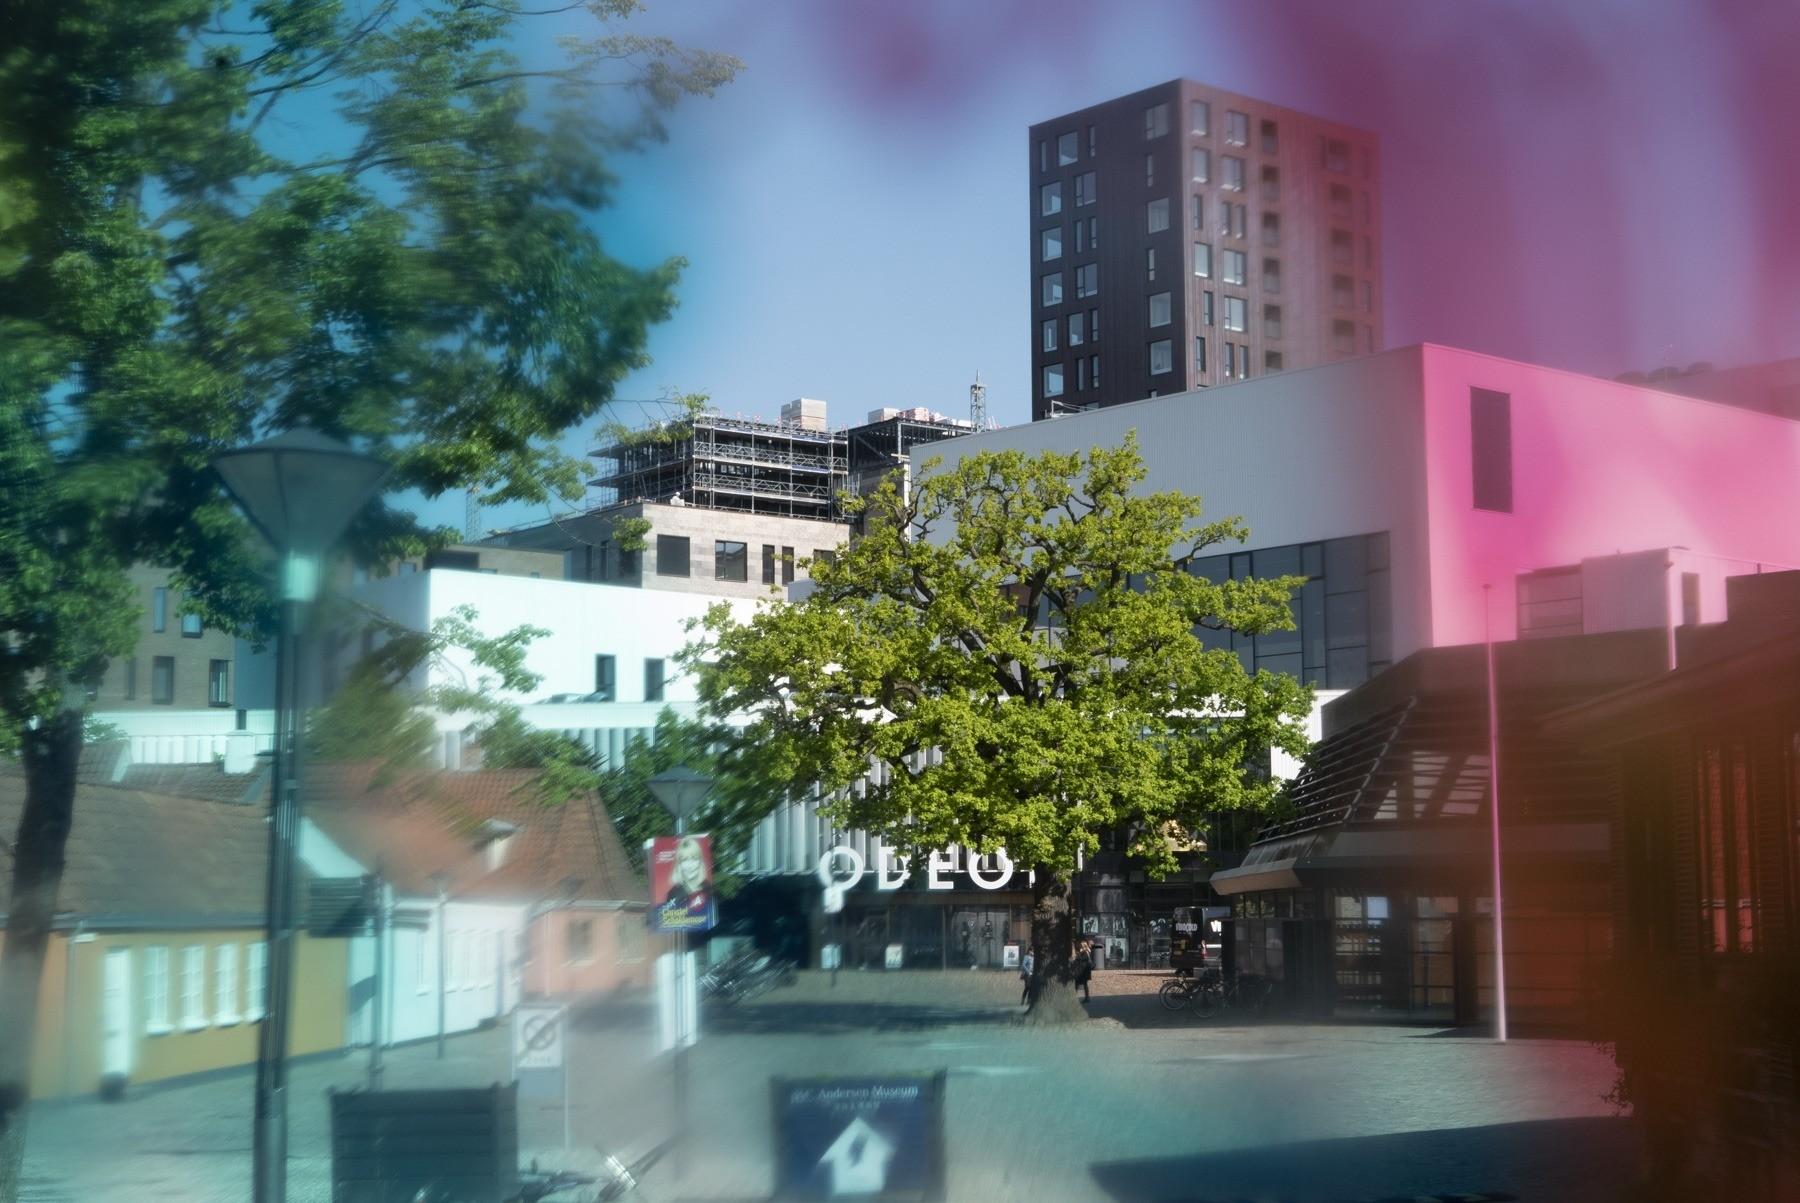 Fotosjov: Farvelader på filtret - skarpt tegnet!